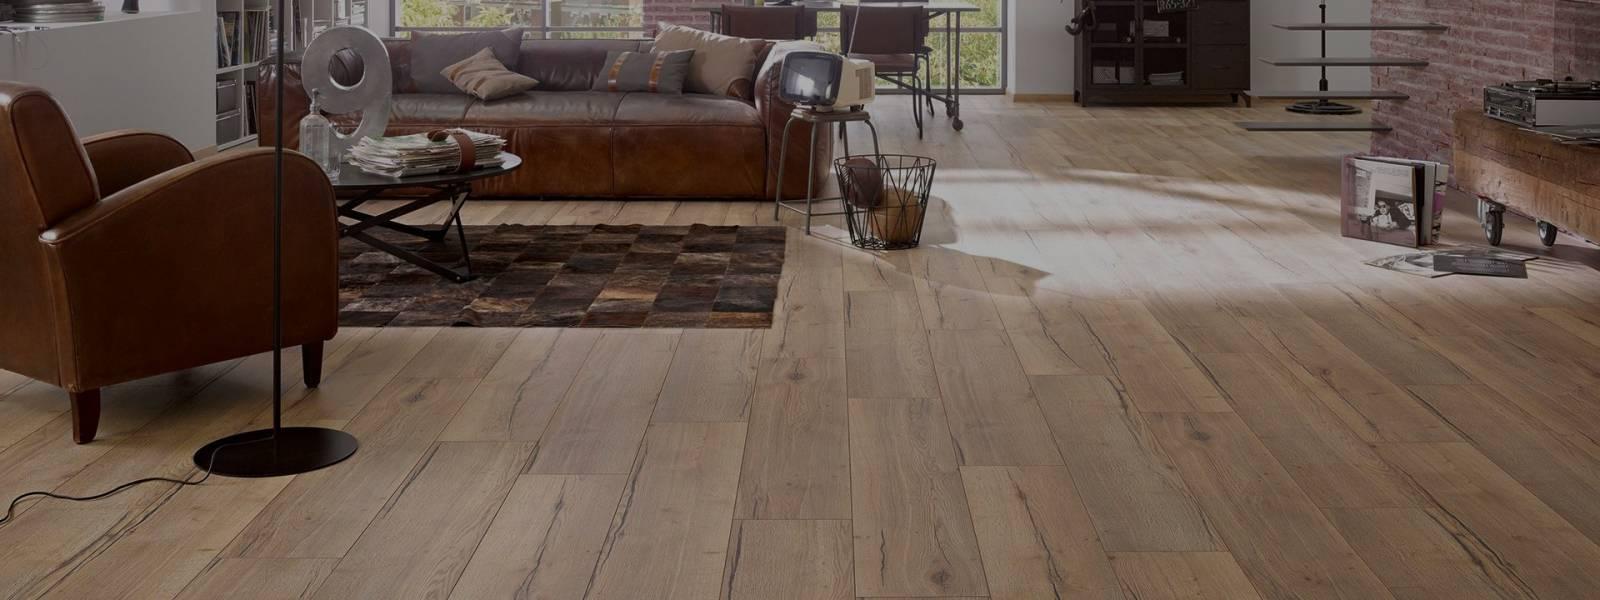 hardwood-floor-reapir